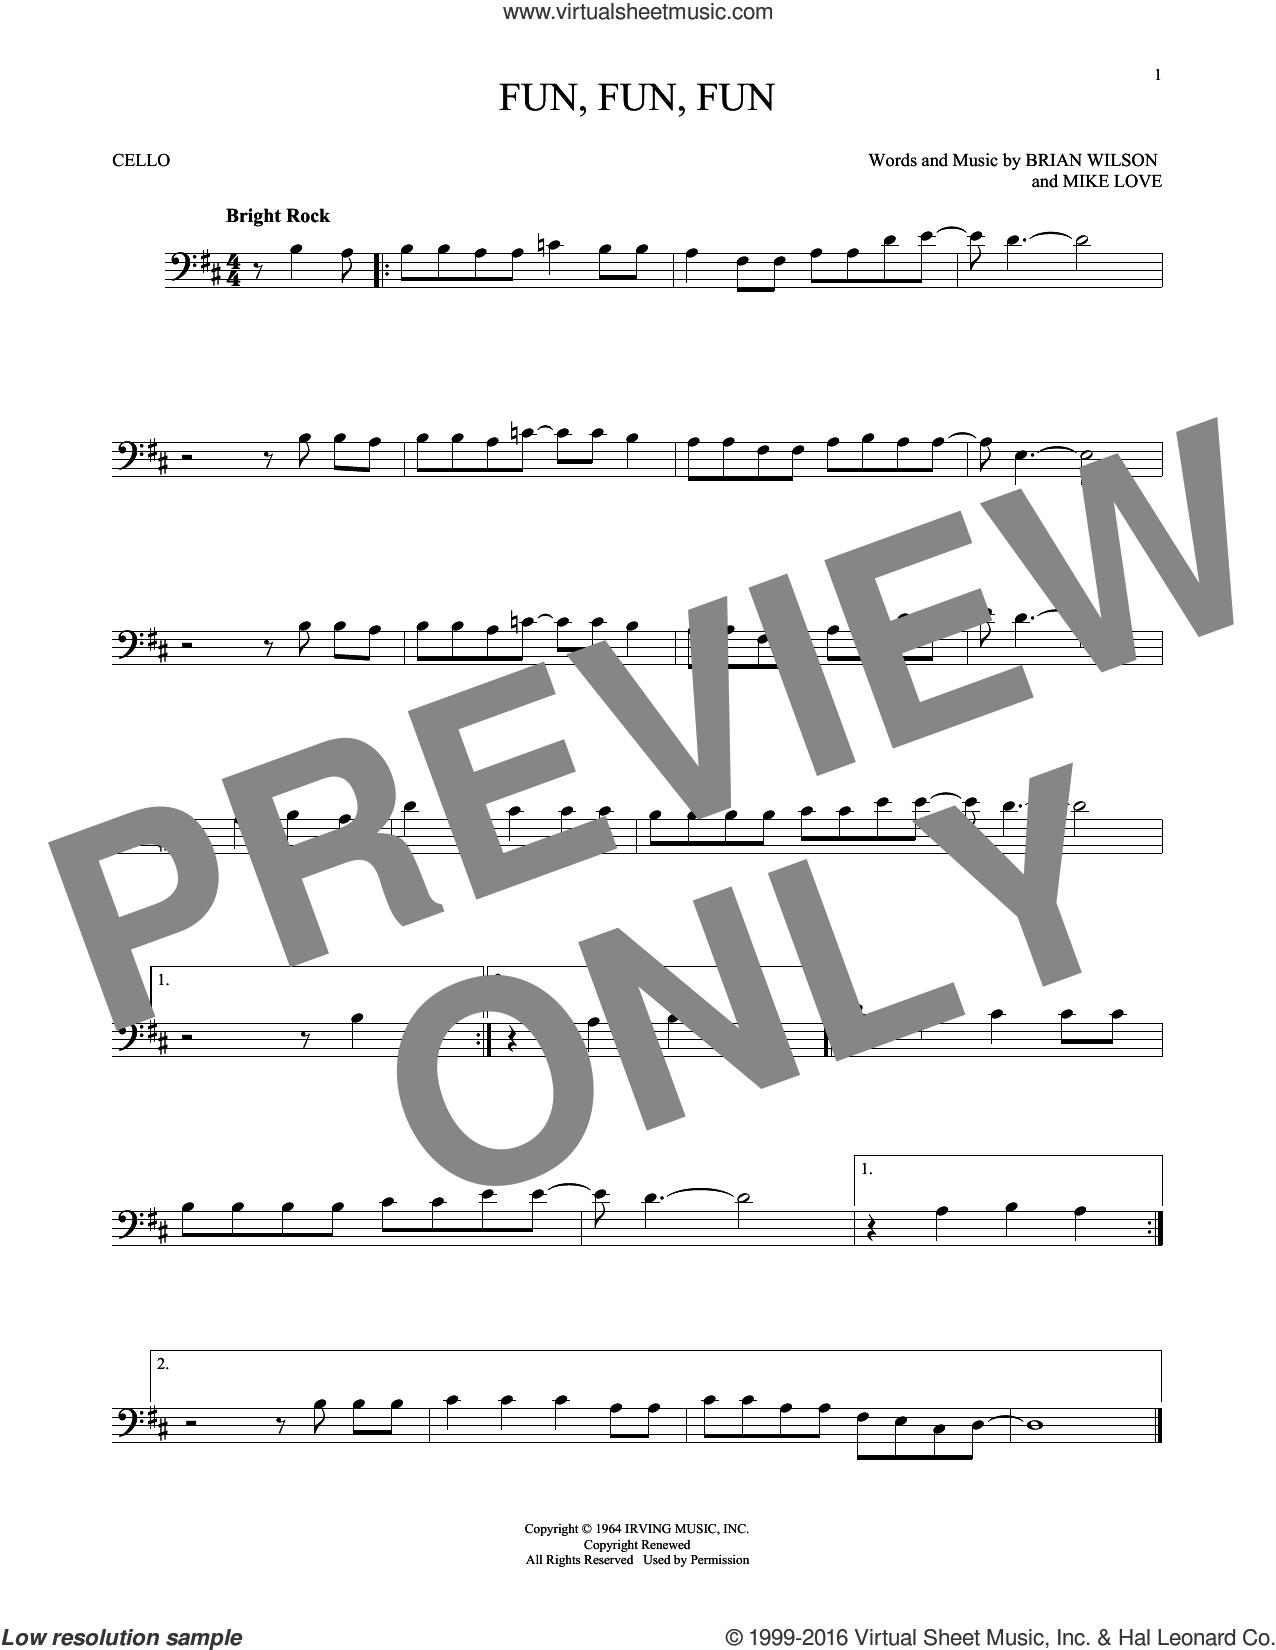 Fun, Fun, Fun sheet music for cello solo by The Beach Boys, Brian Wilson and Mike Love, intermediate skill level